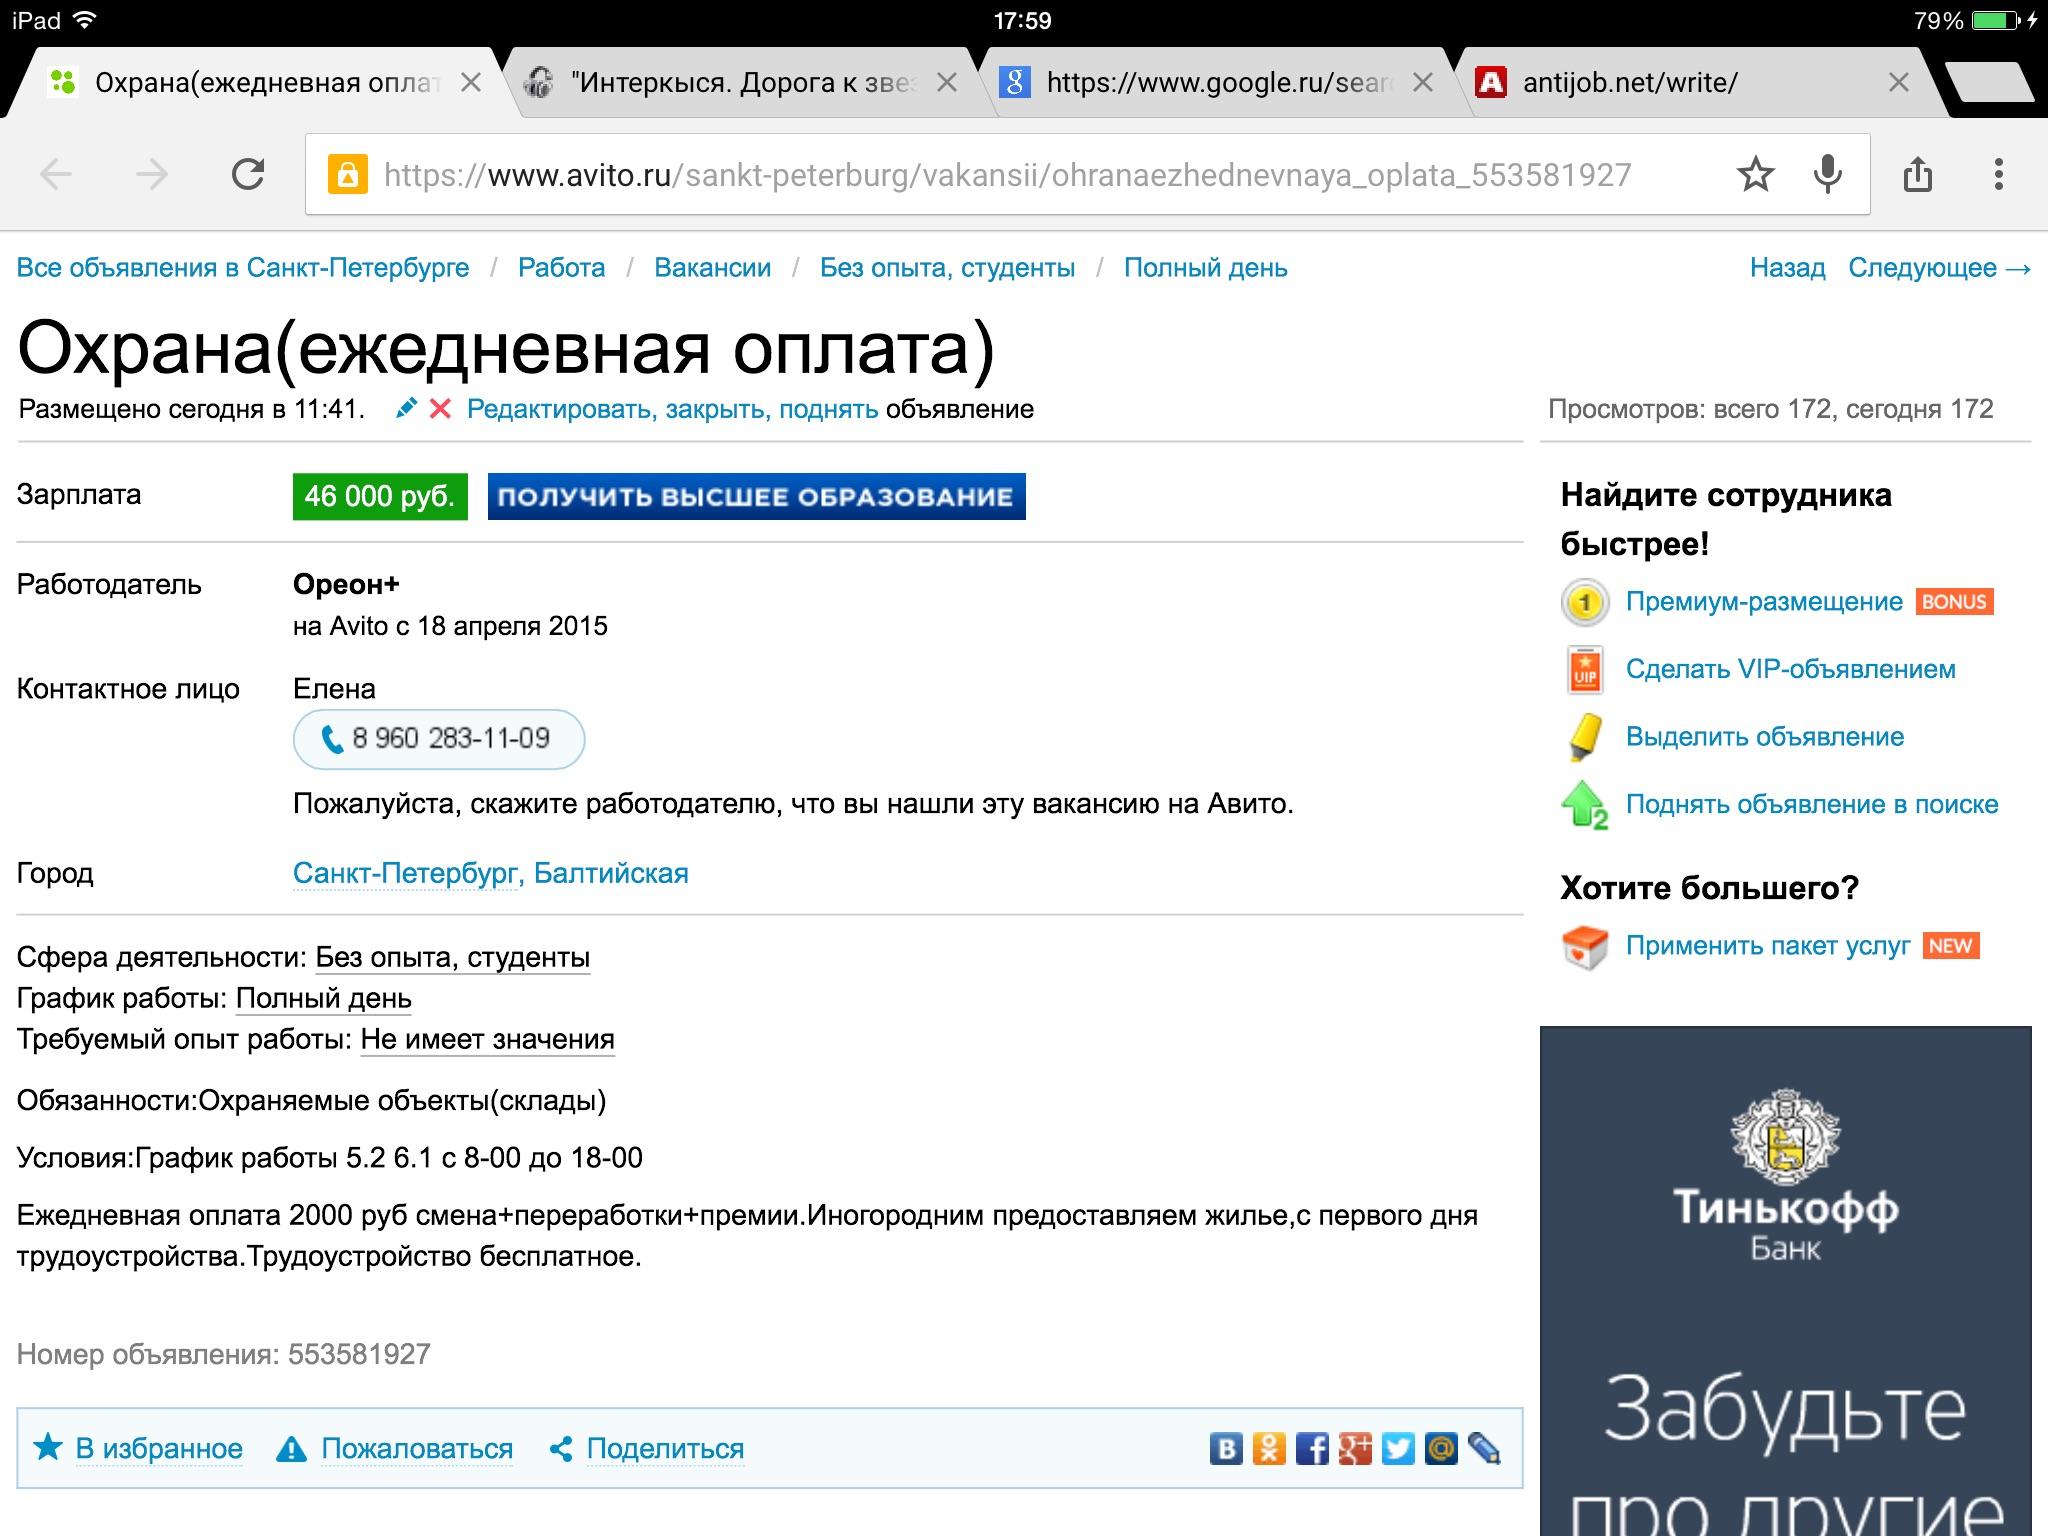 Oroplrme5g_4353e761_c991_d9ed_06c2_b725c610b002